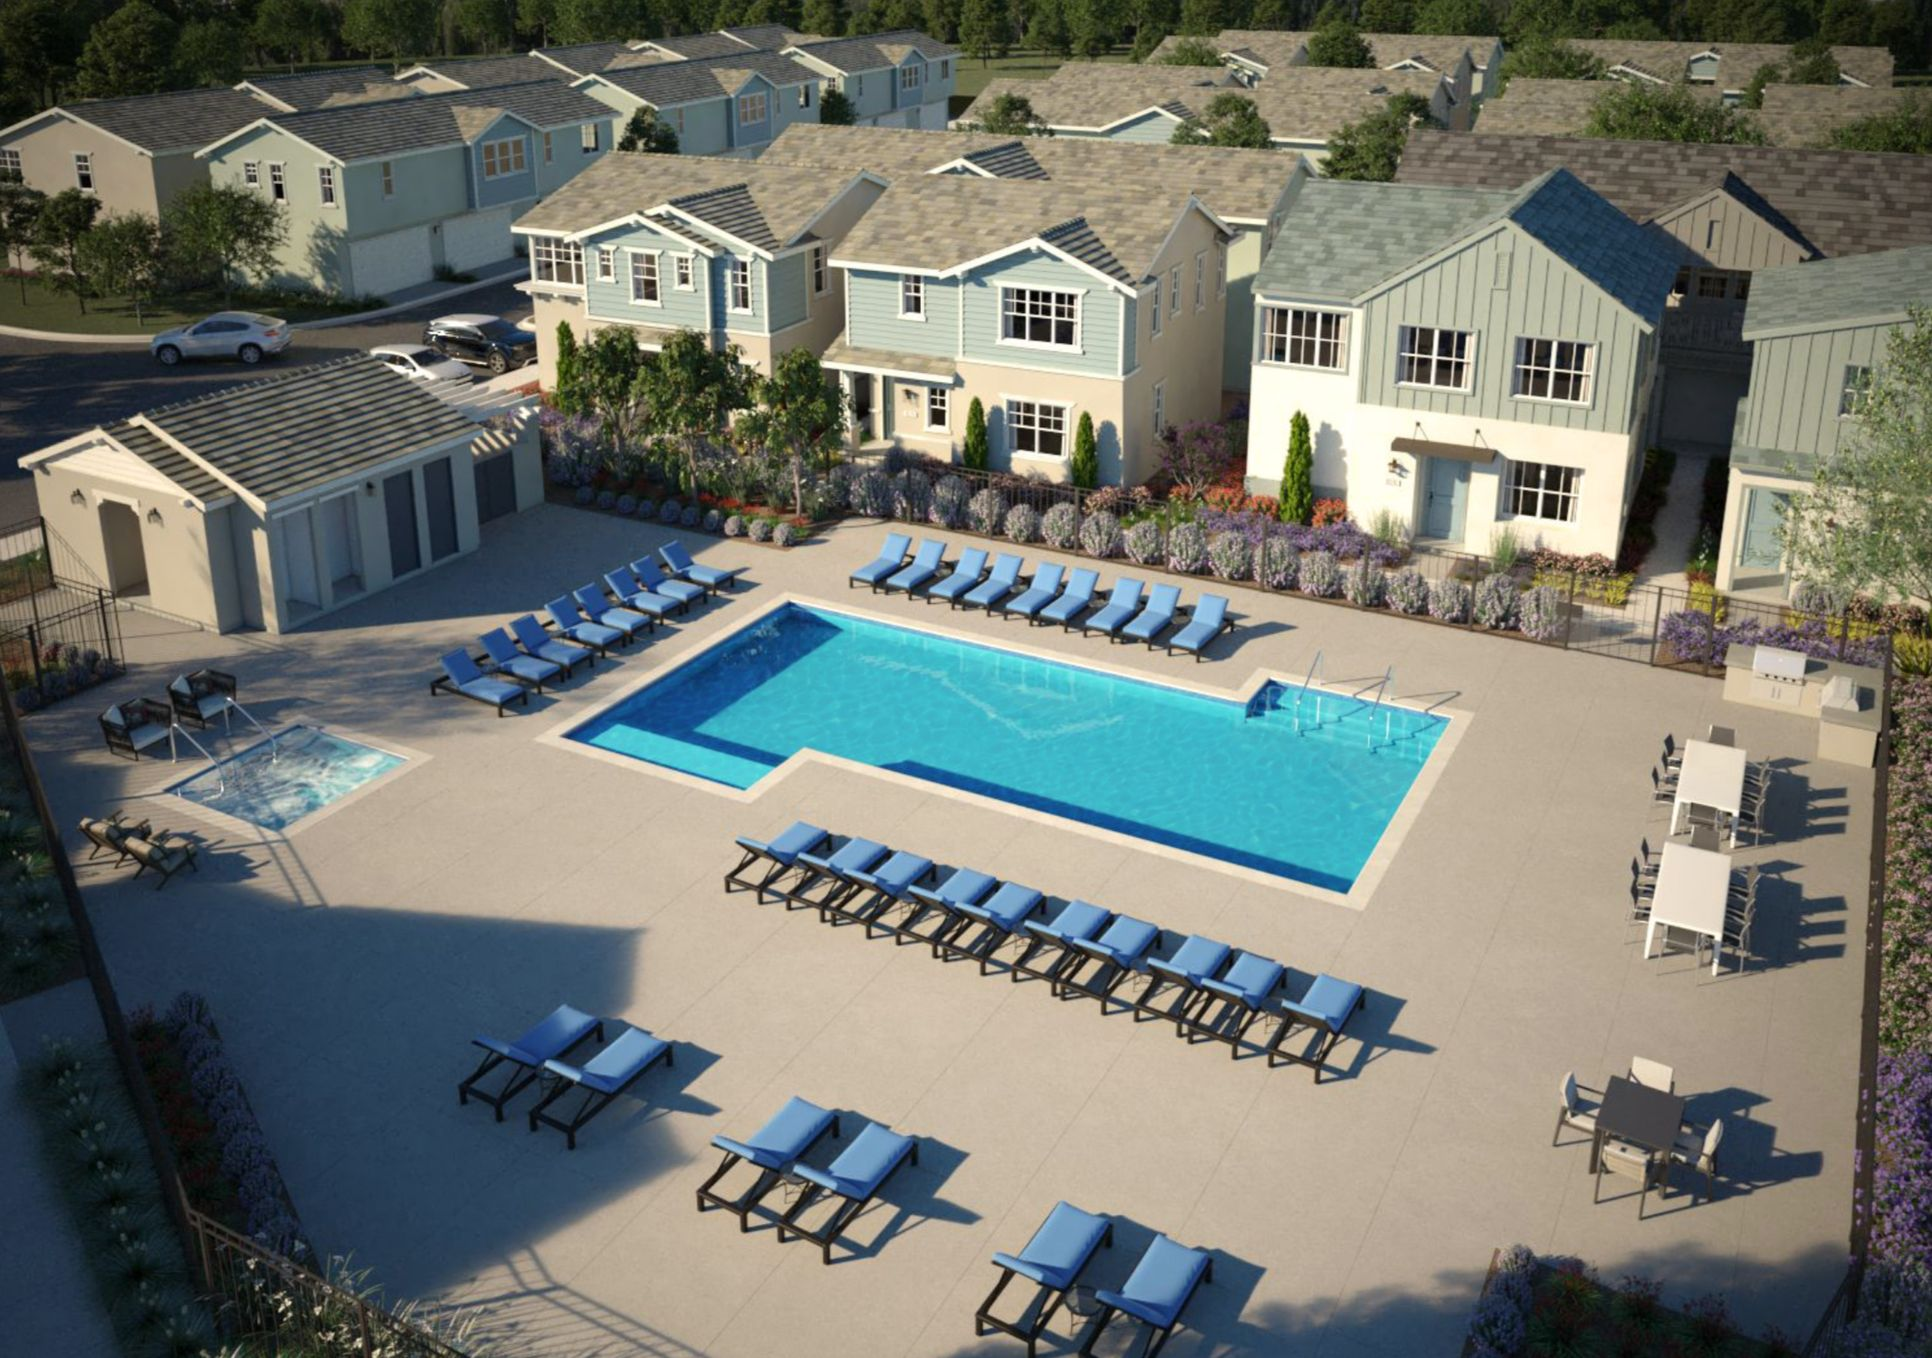 Pool, Spa & BBQ Complex:Pool, Spa & BBQ Complex